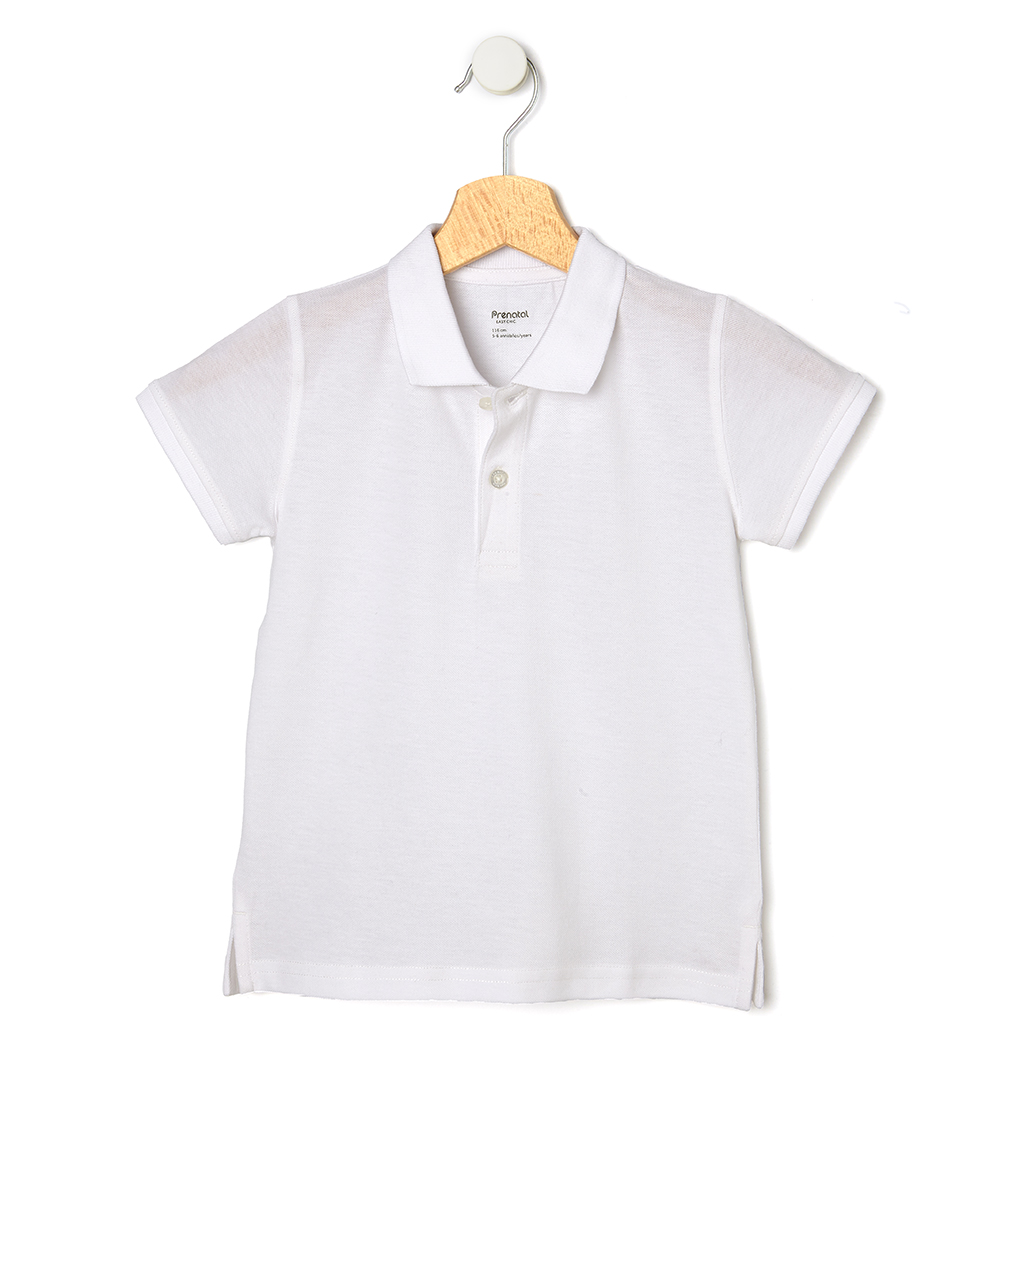 T-Shirt Πόλο Πικέ Λευκό Μεγ.8-9/9-10 ετών για Αγόρι